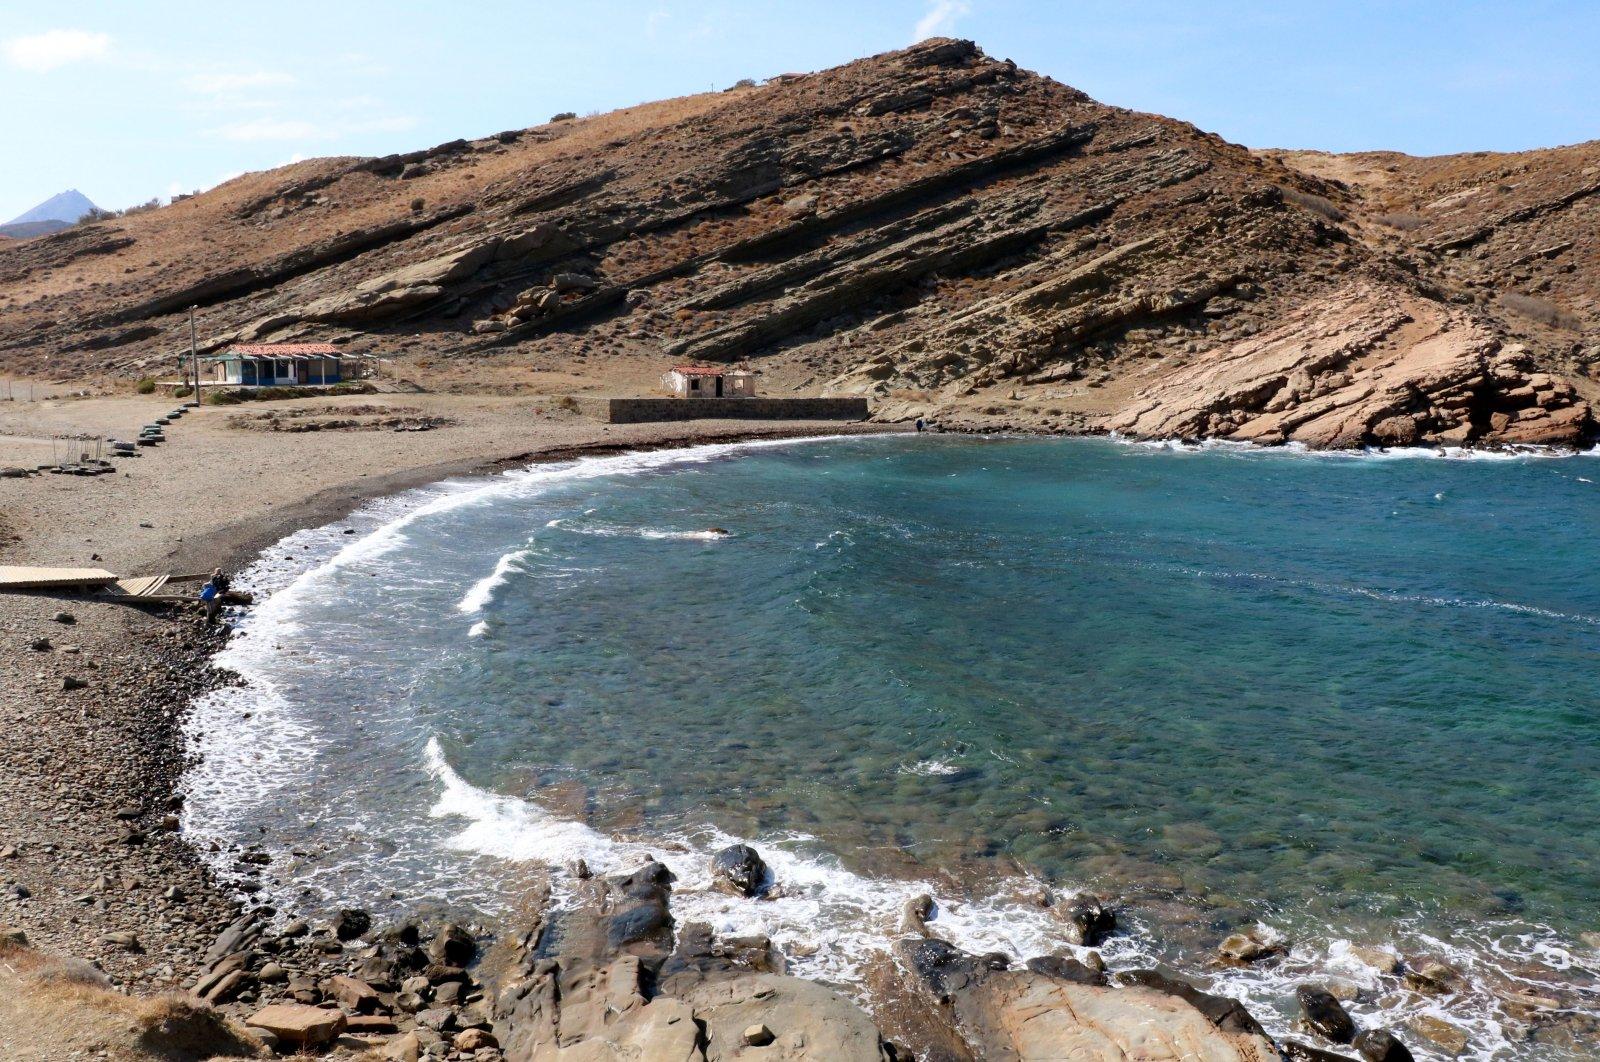 A view of Yıldız Cove, in Gökçeada island, in Çanakkale, western Turkey, Oct. 7, 2021. (DHA PHOTO)